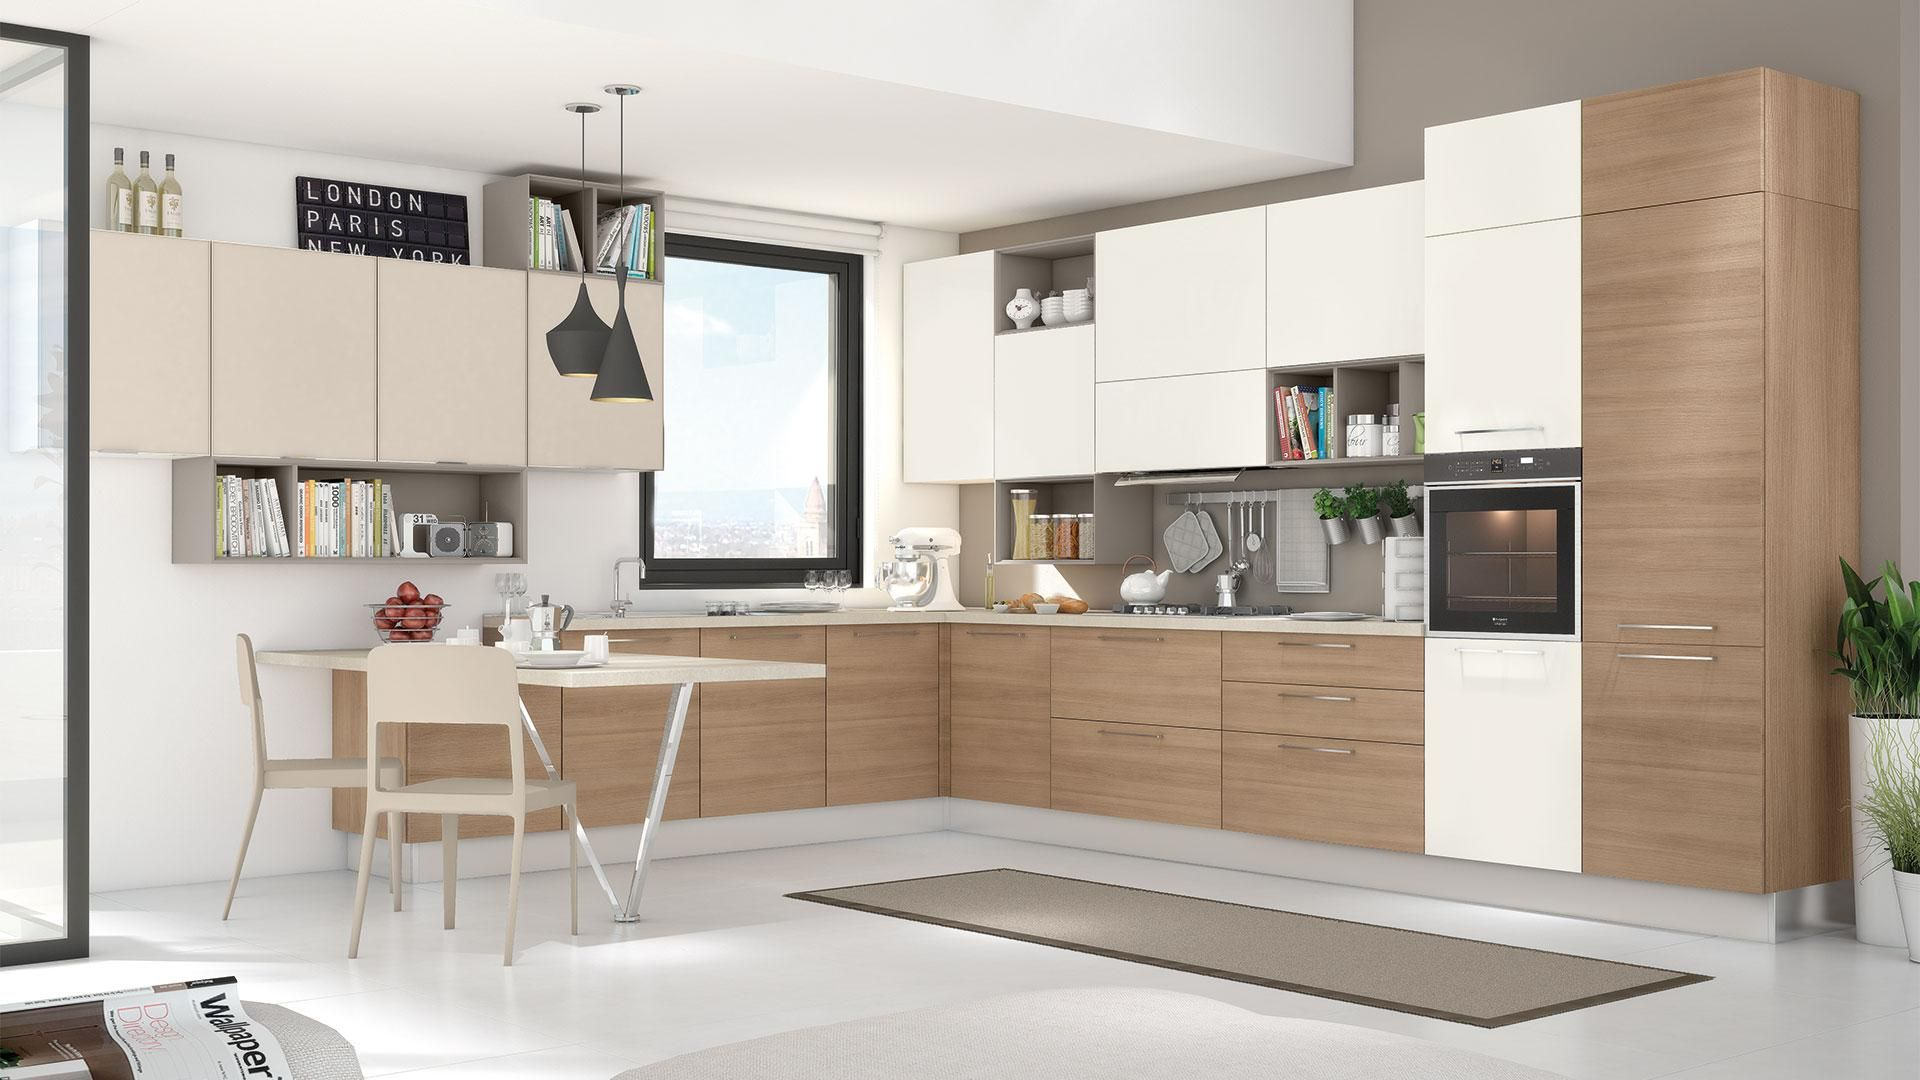 Noemi - Cucine Moderne - Cucine Lube | Interior design ...